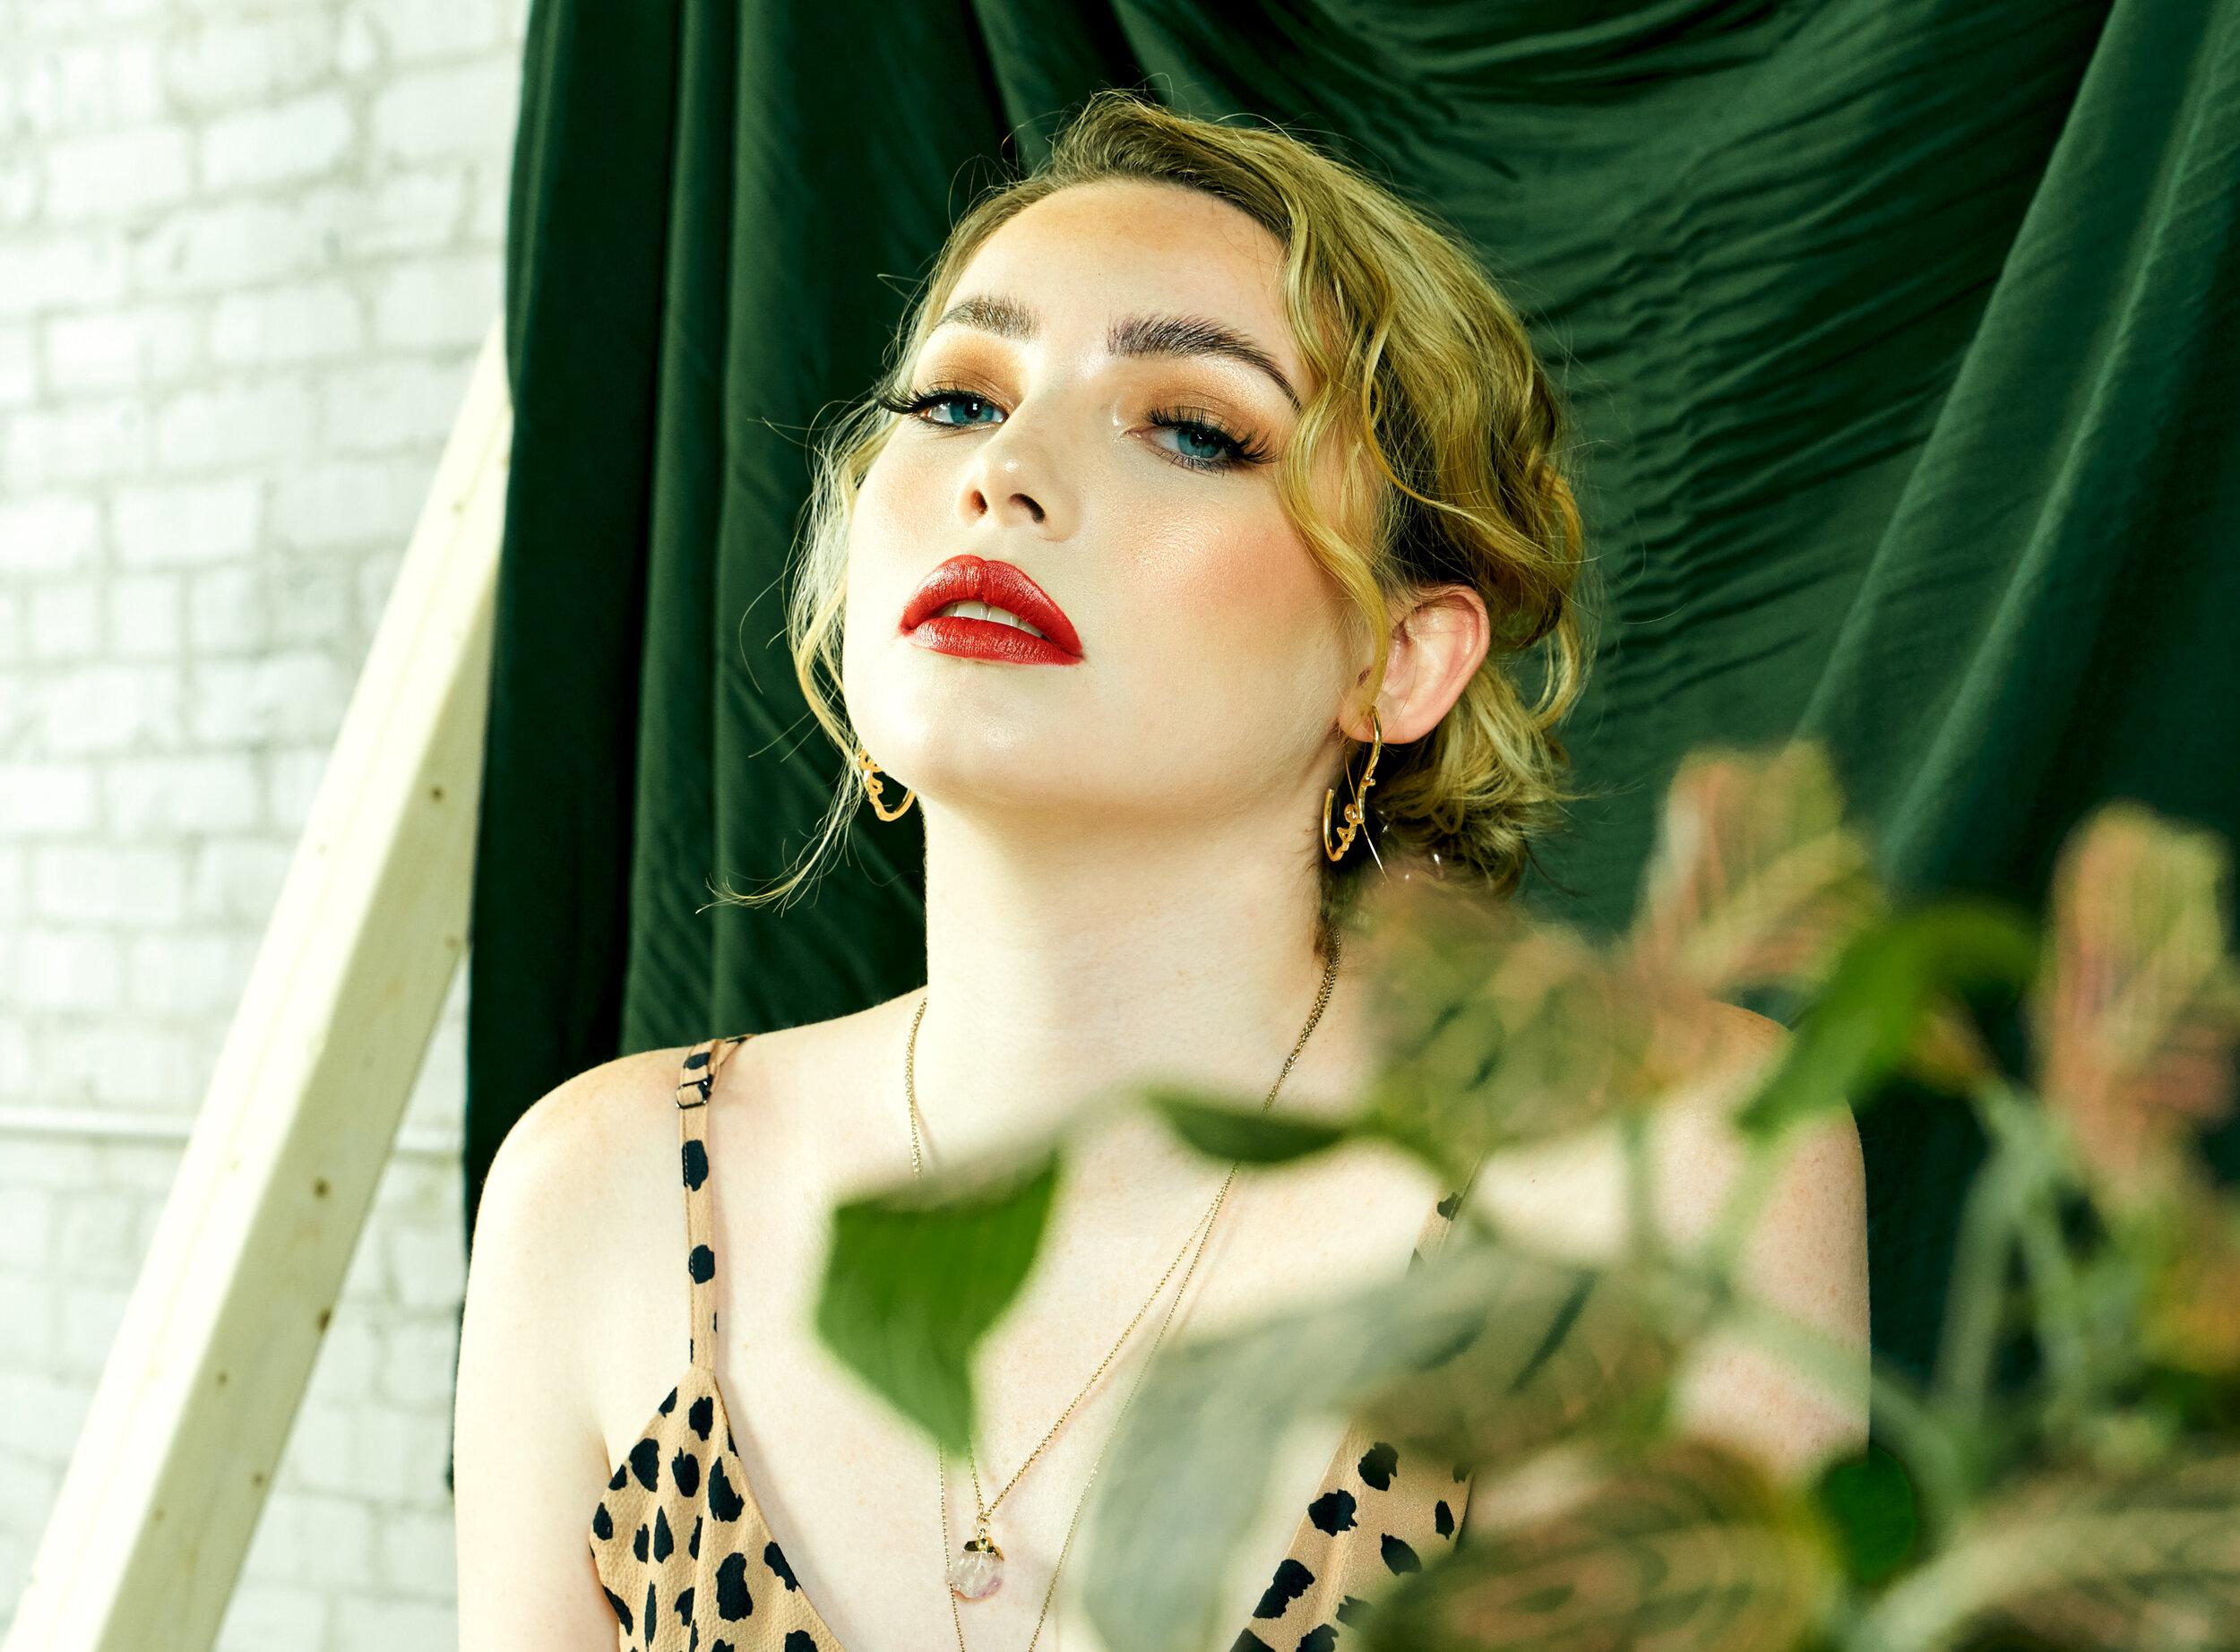 Photographer: Jessa Mayhew Model: Alexis Fabish